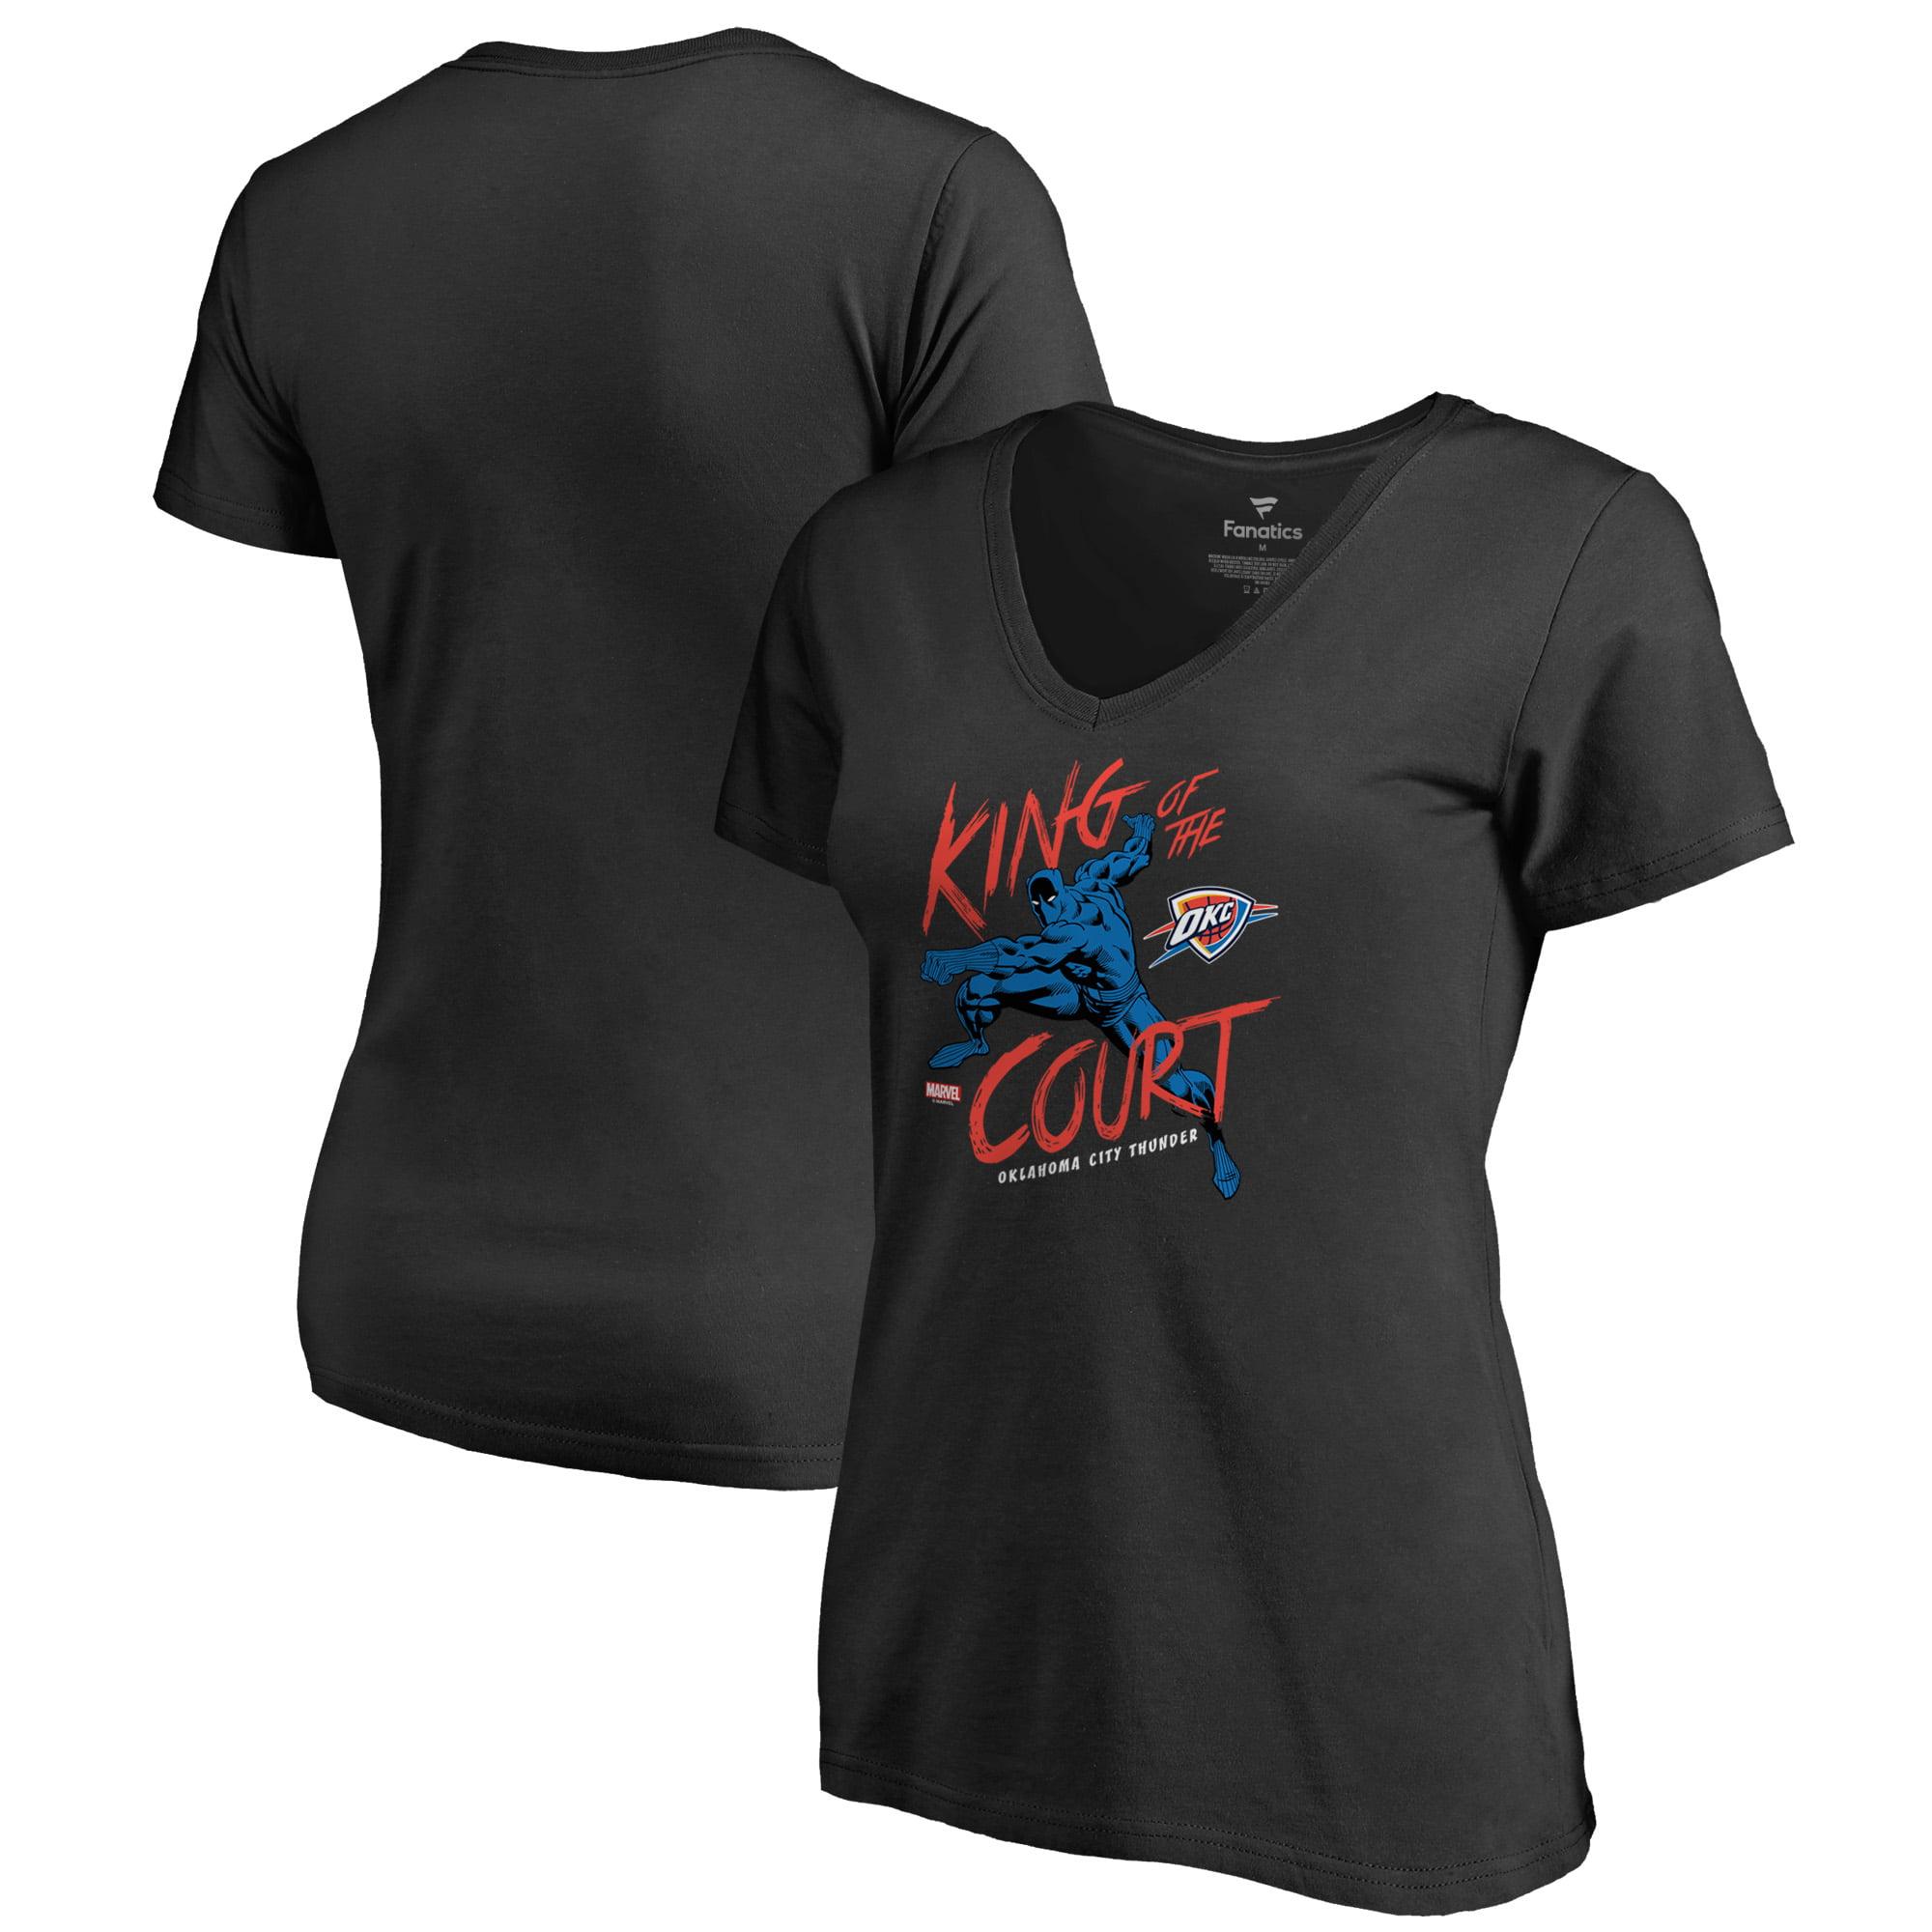 Oklahoma City Thunder Fanatics Branded Women's Marvel Black Panther King of the Court V-Neck T-Shirt - Black